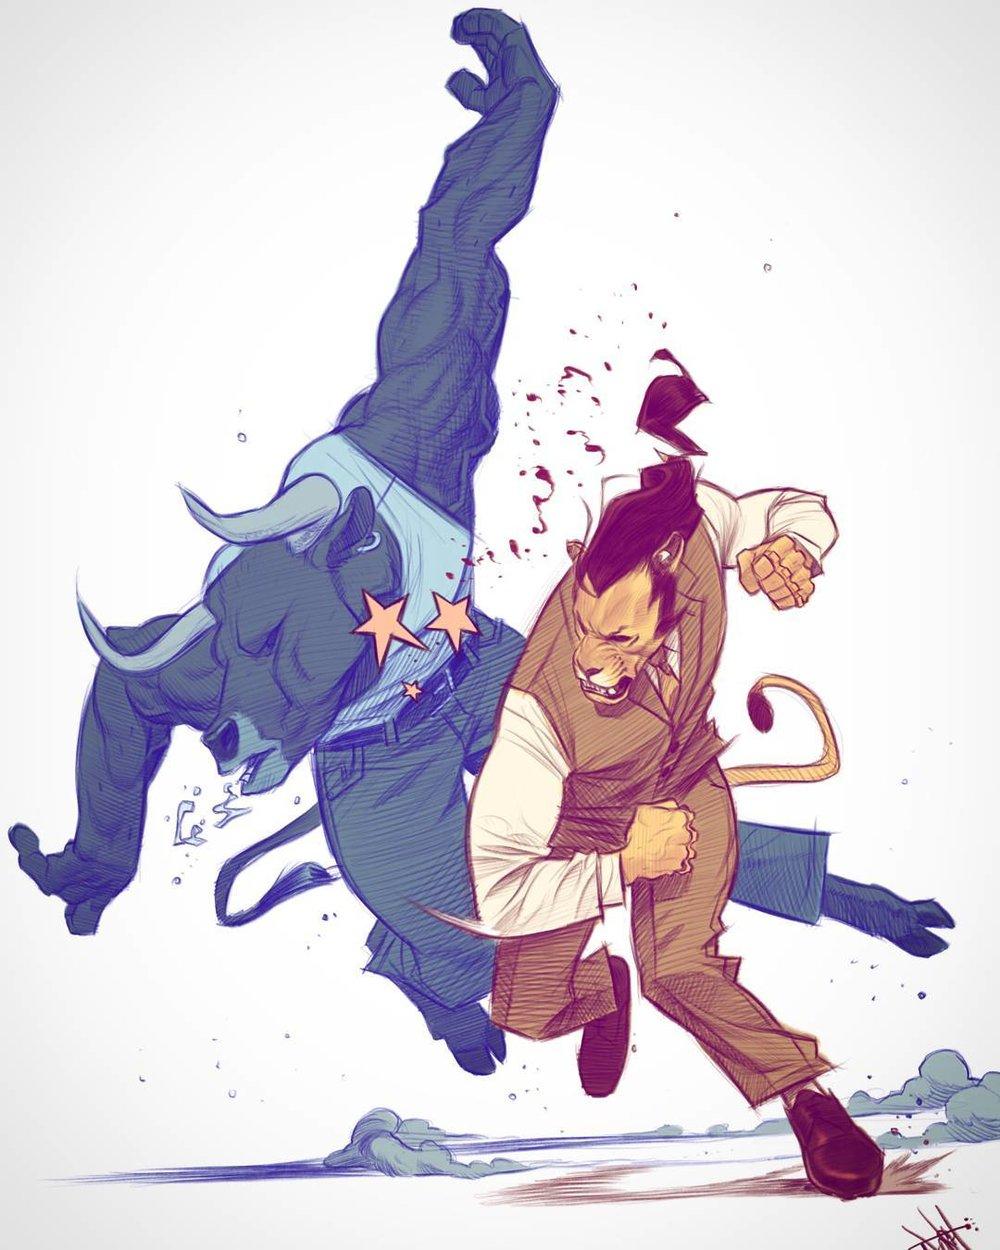 Koteriink_fight.jpg